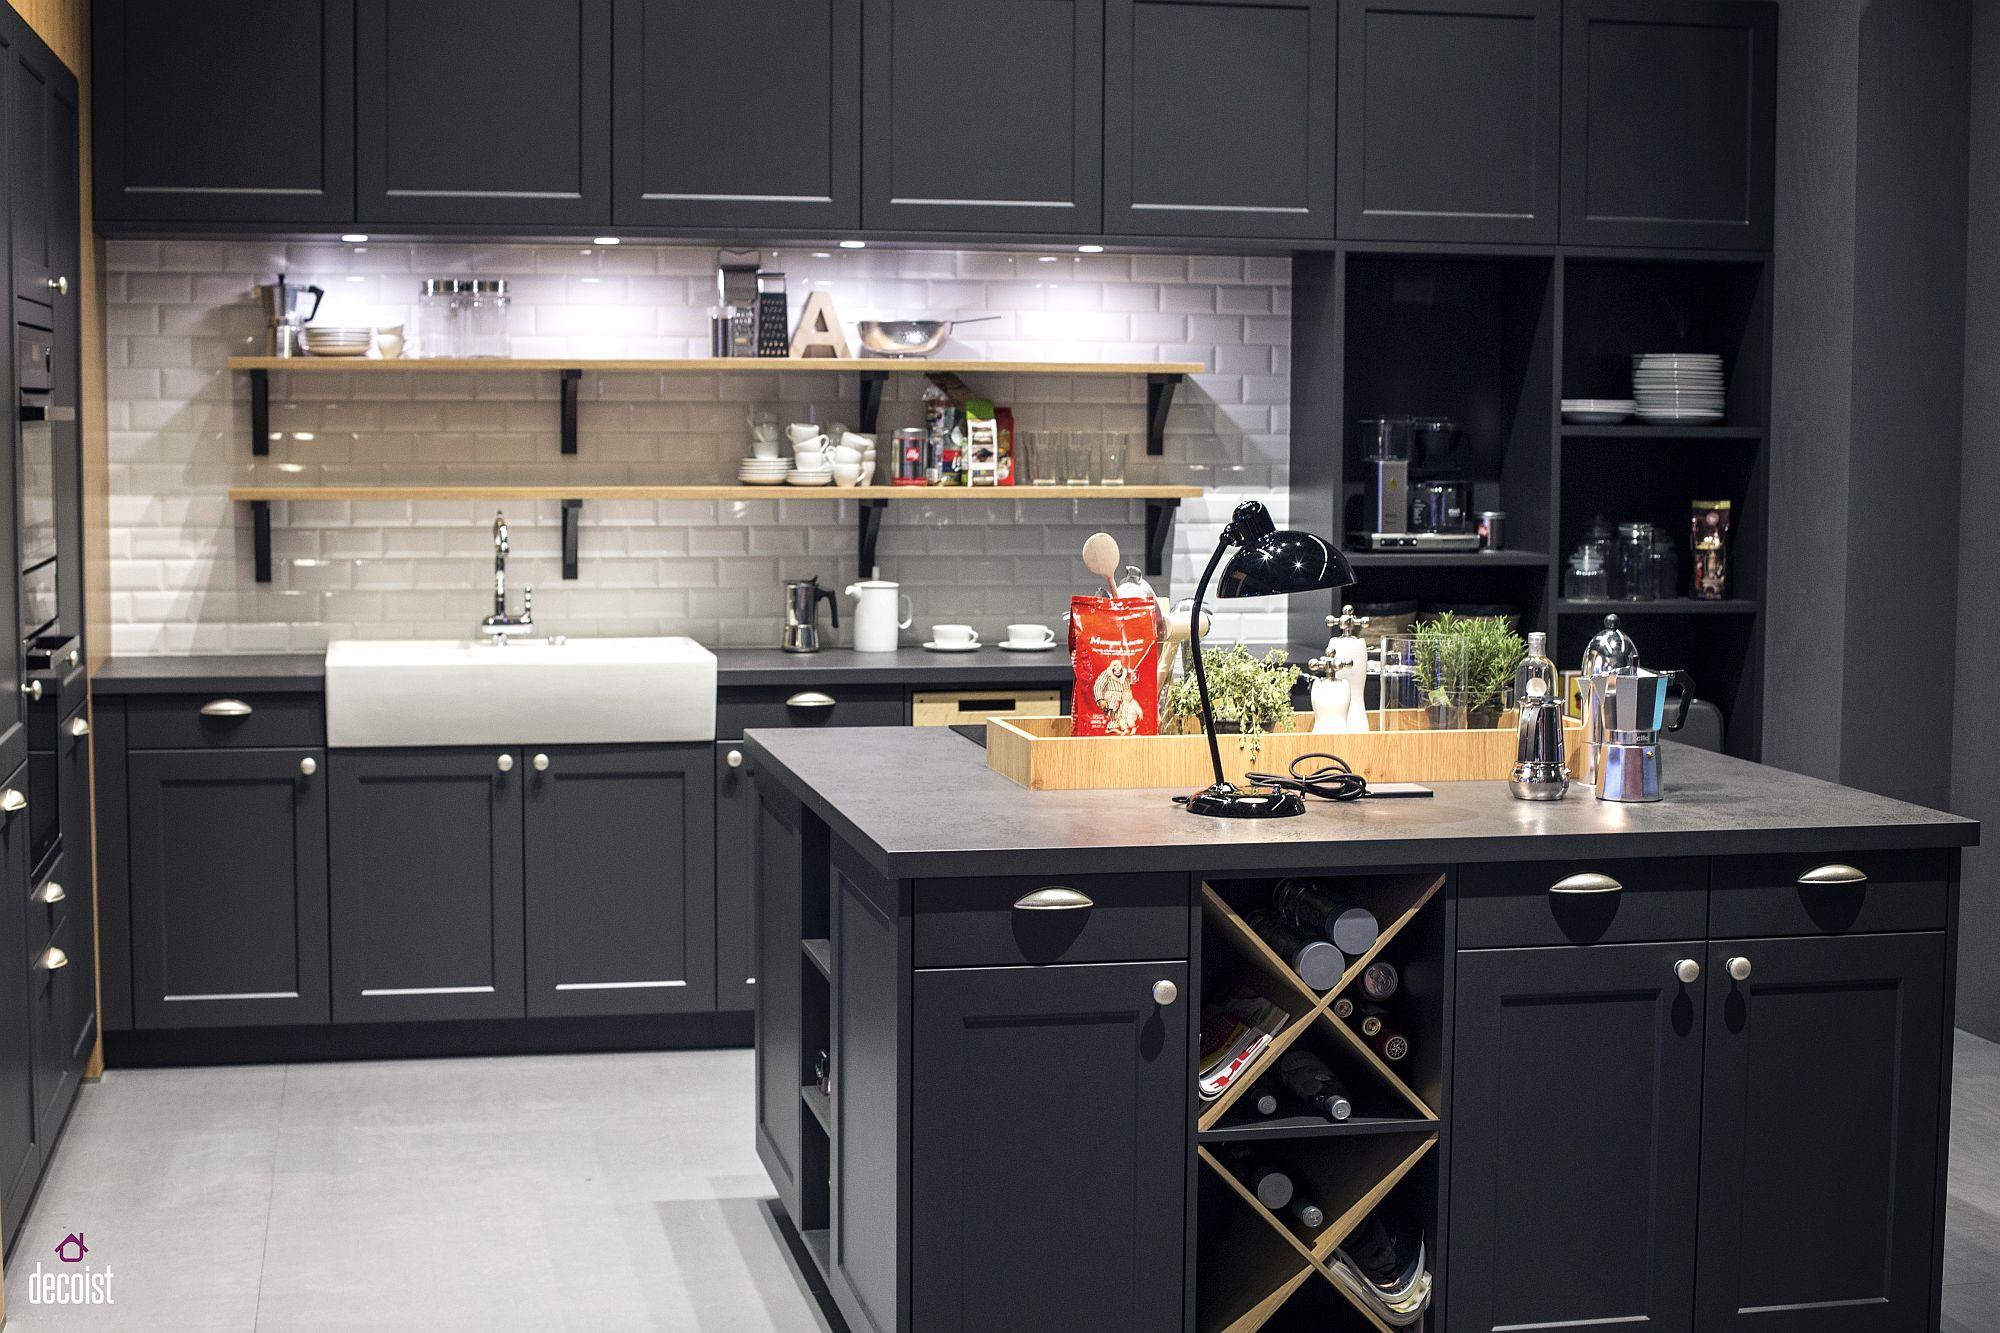 Integrating-wine-storage-into-the-kitchen-island